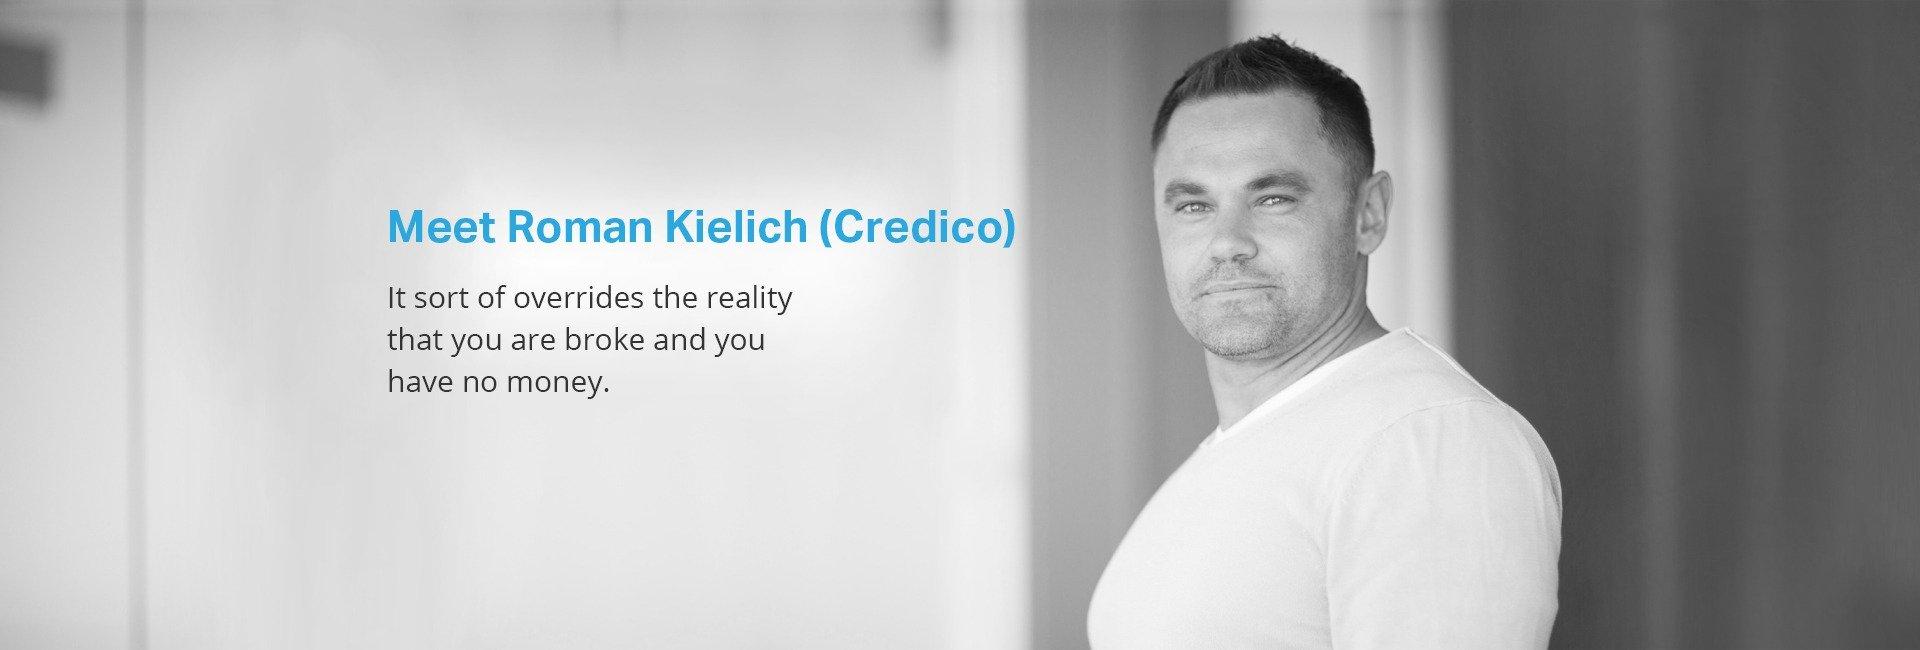 Roman Kielich